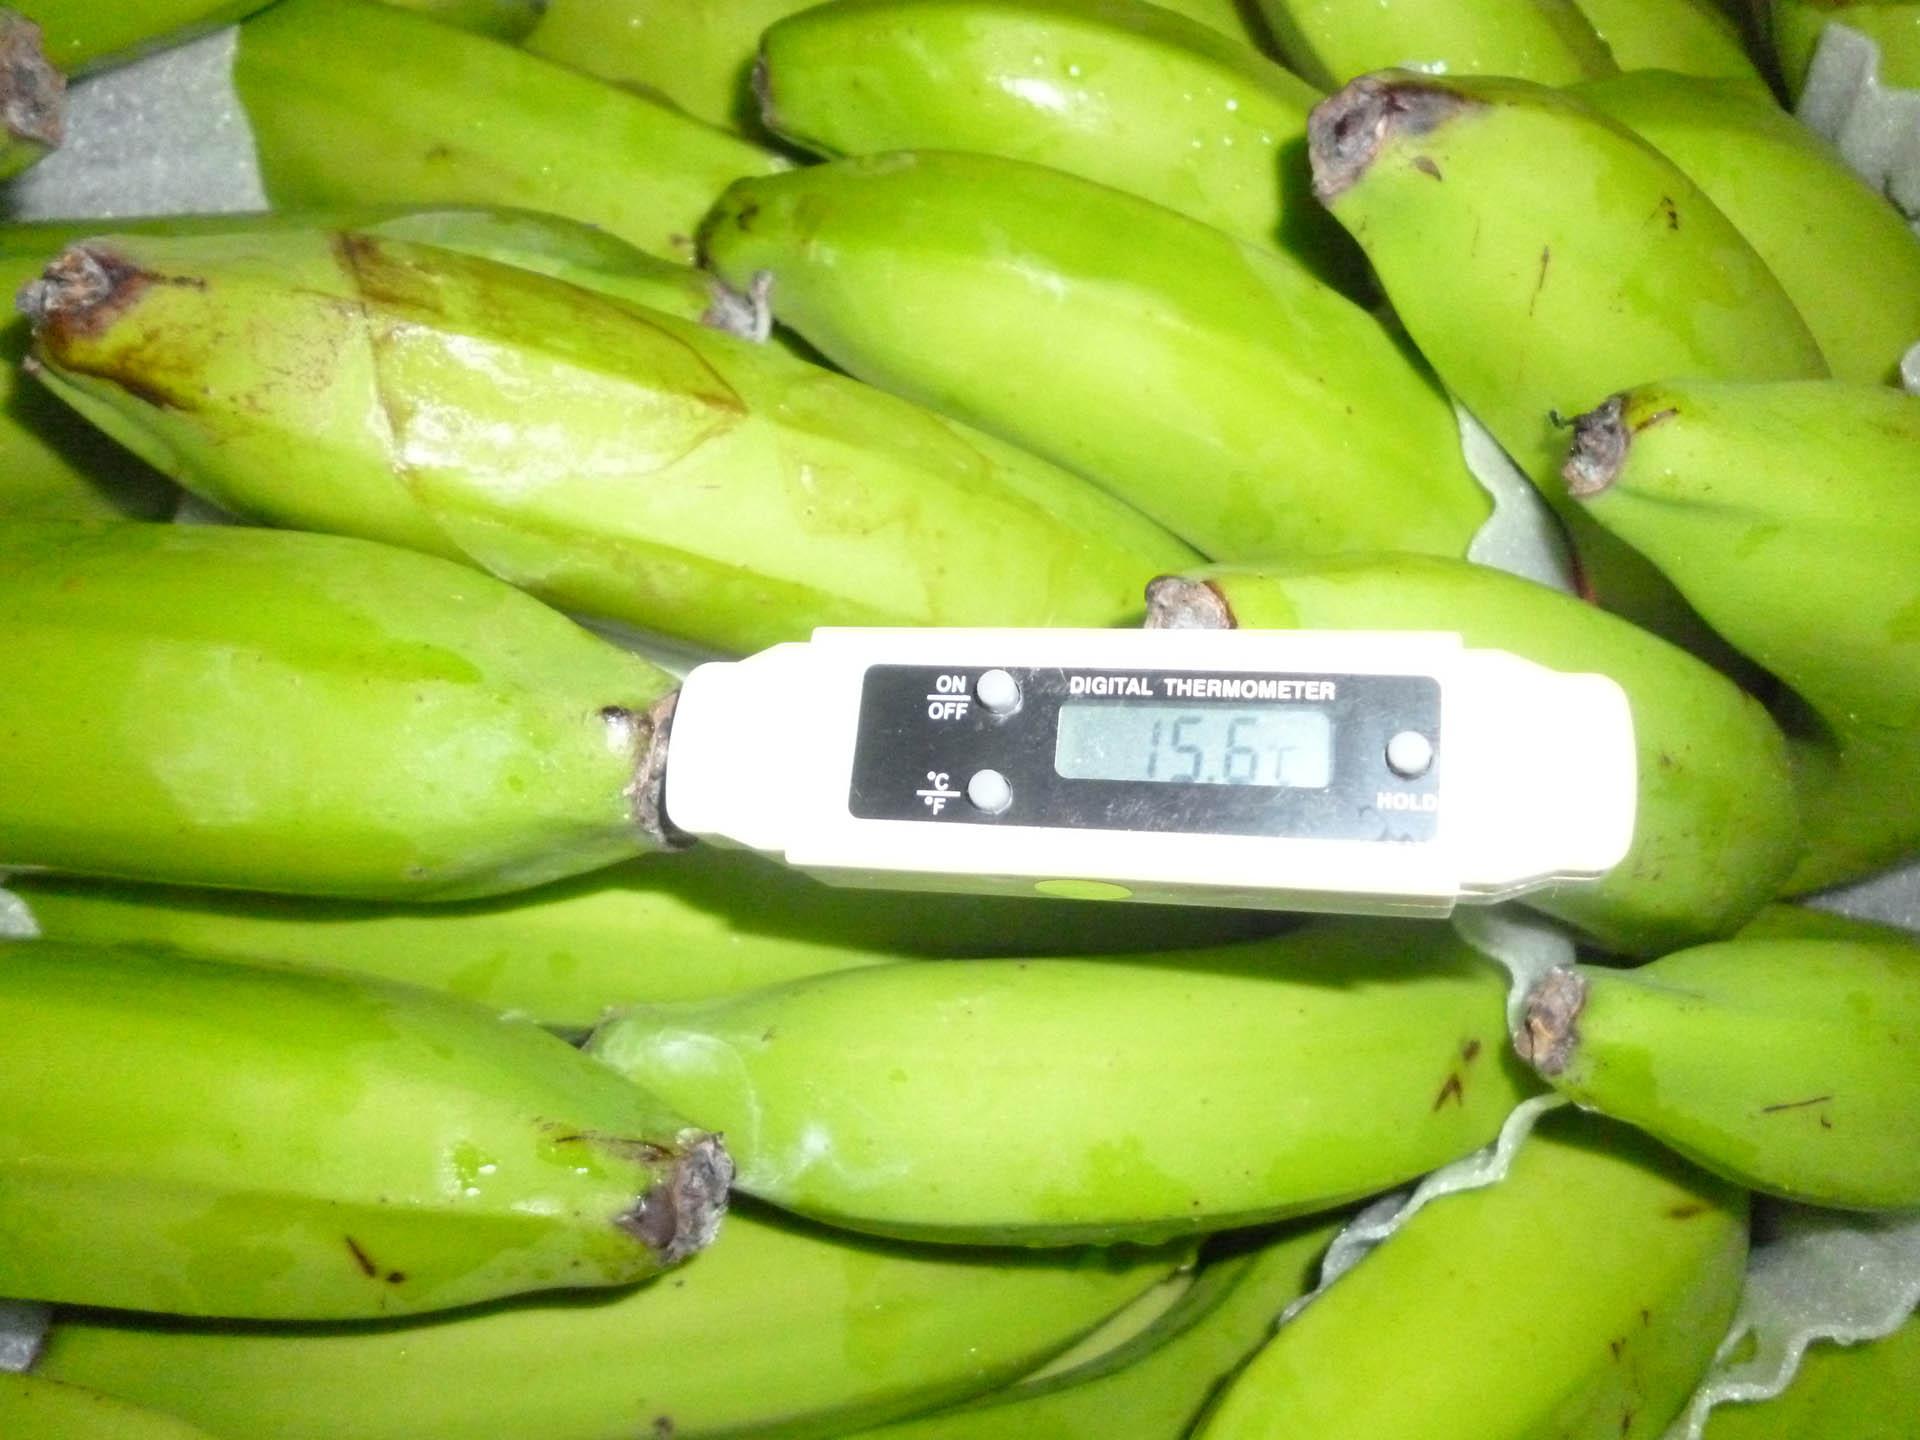 Fruit Inspection 4